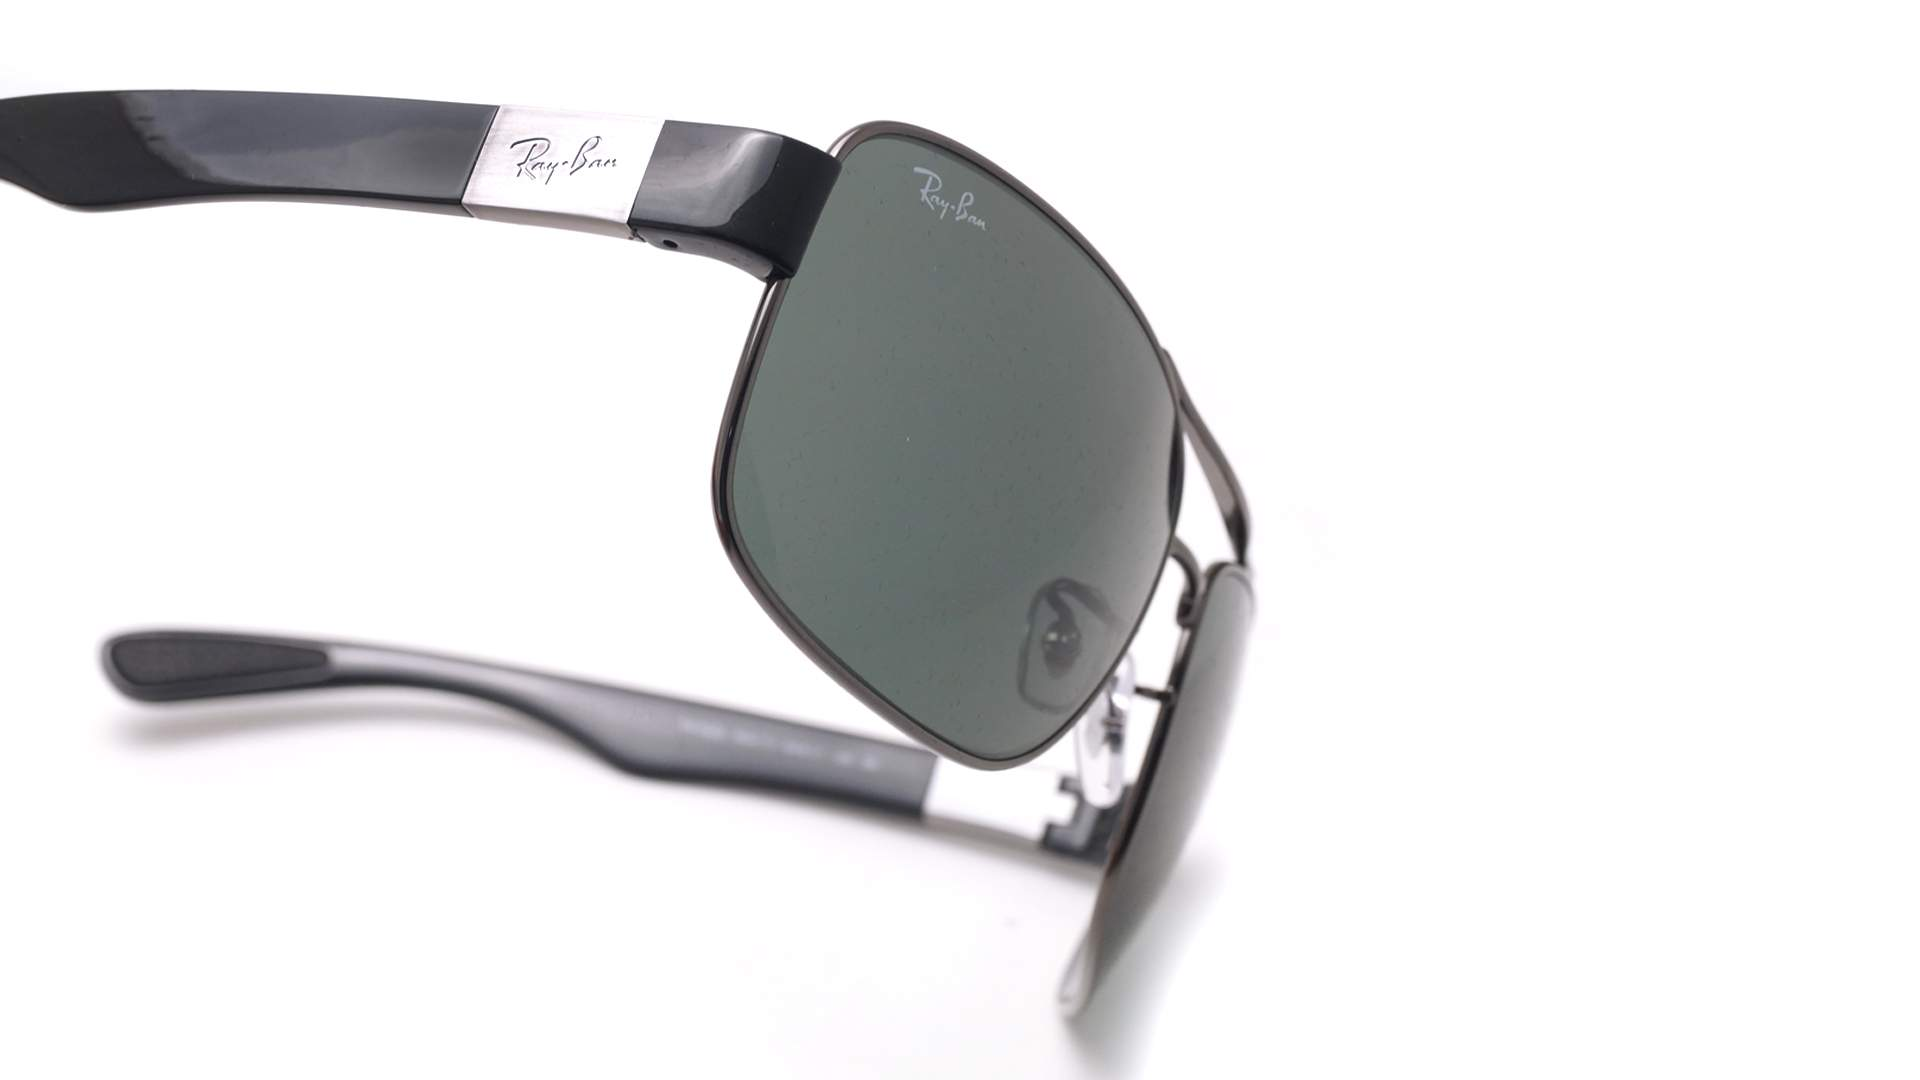 9d176654eb8 Sunglasses Ray-Ban RB3522 004 71 64-17 Silver Large. Medium